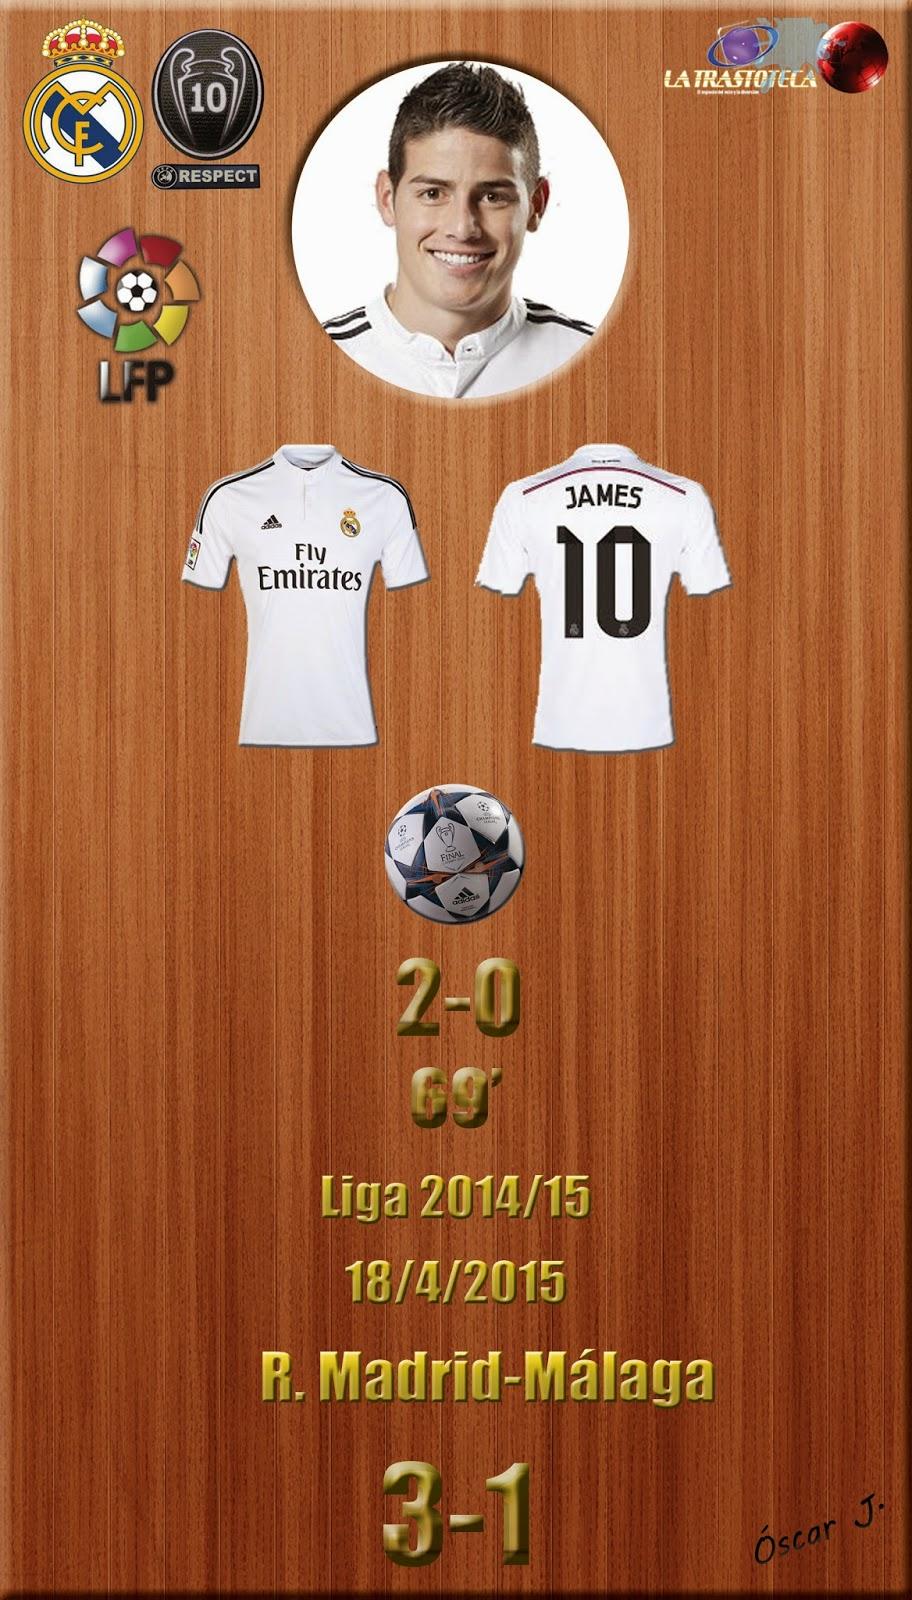 James Rodríguez (2-0) - Real Madrid 3-1 Málaga - Liga 2014/15 - Jornada 32 - (18/4/2015)